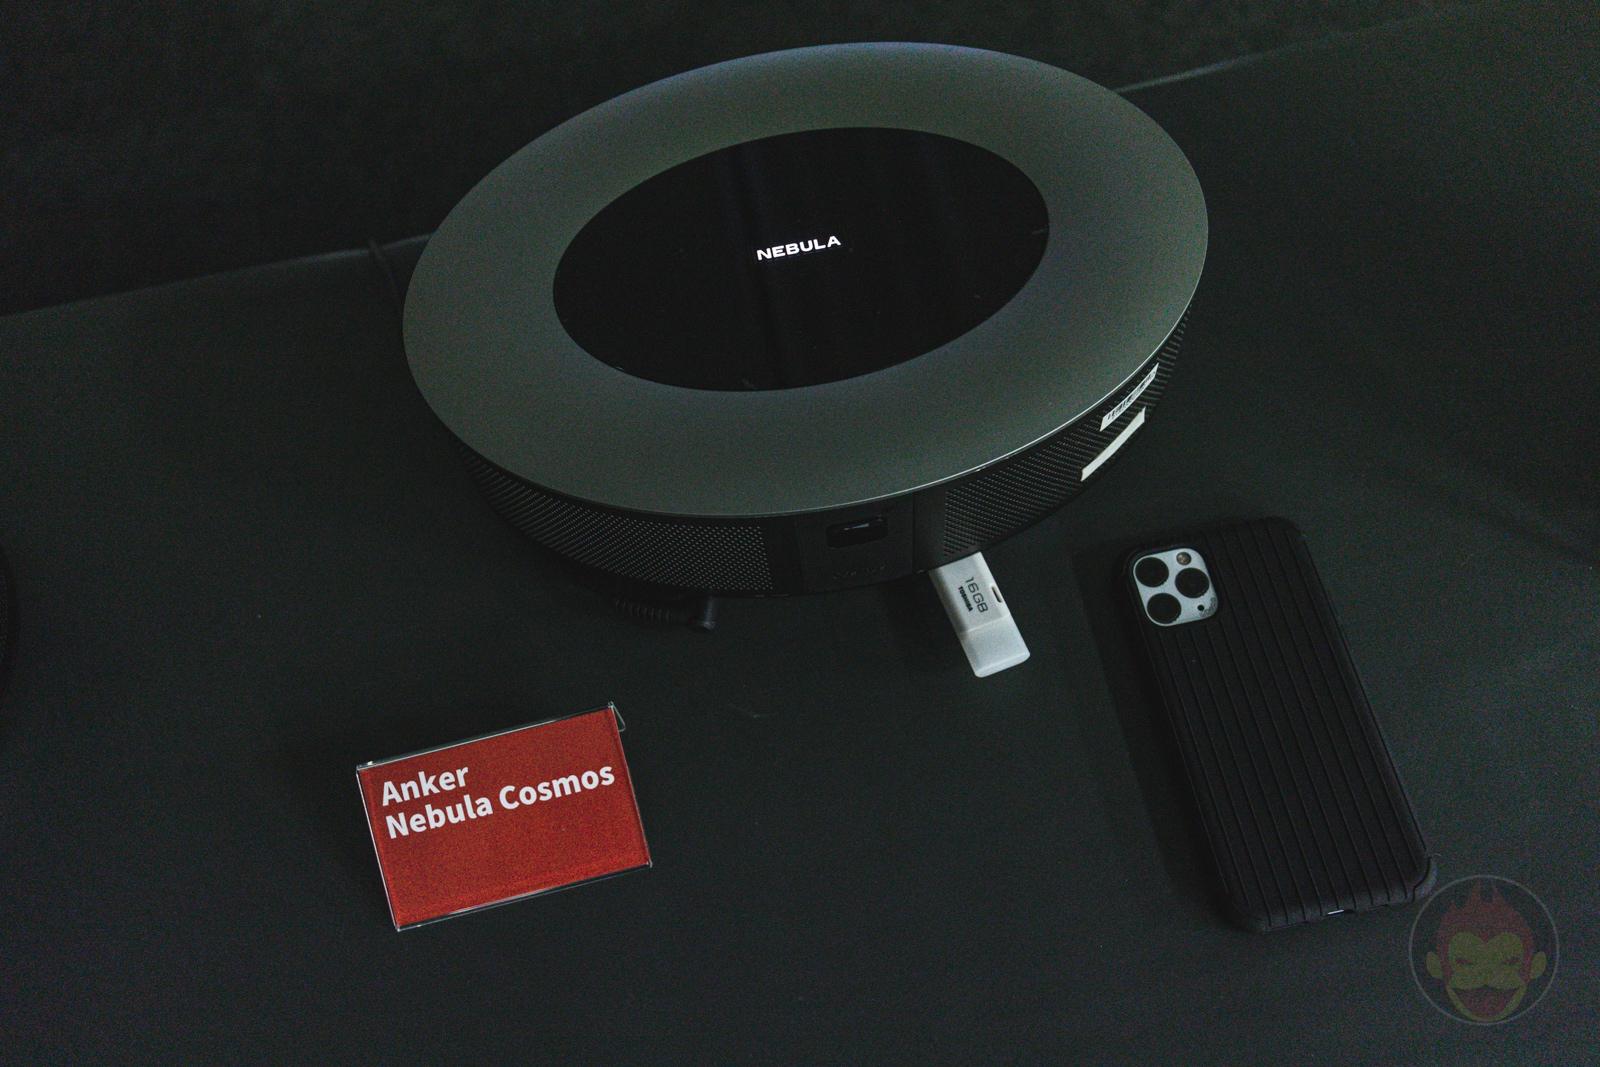 Anker-Nebula-Cosmos-Crowdfunding-Expo-2020-Spring-03.jpg